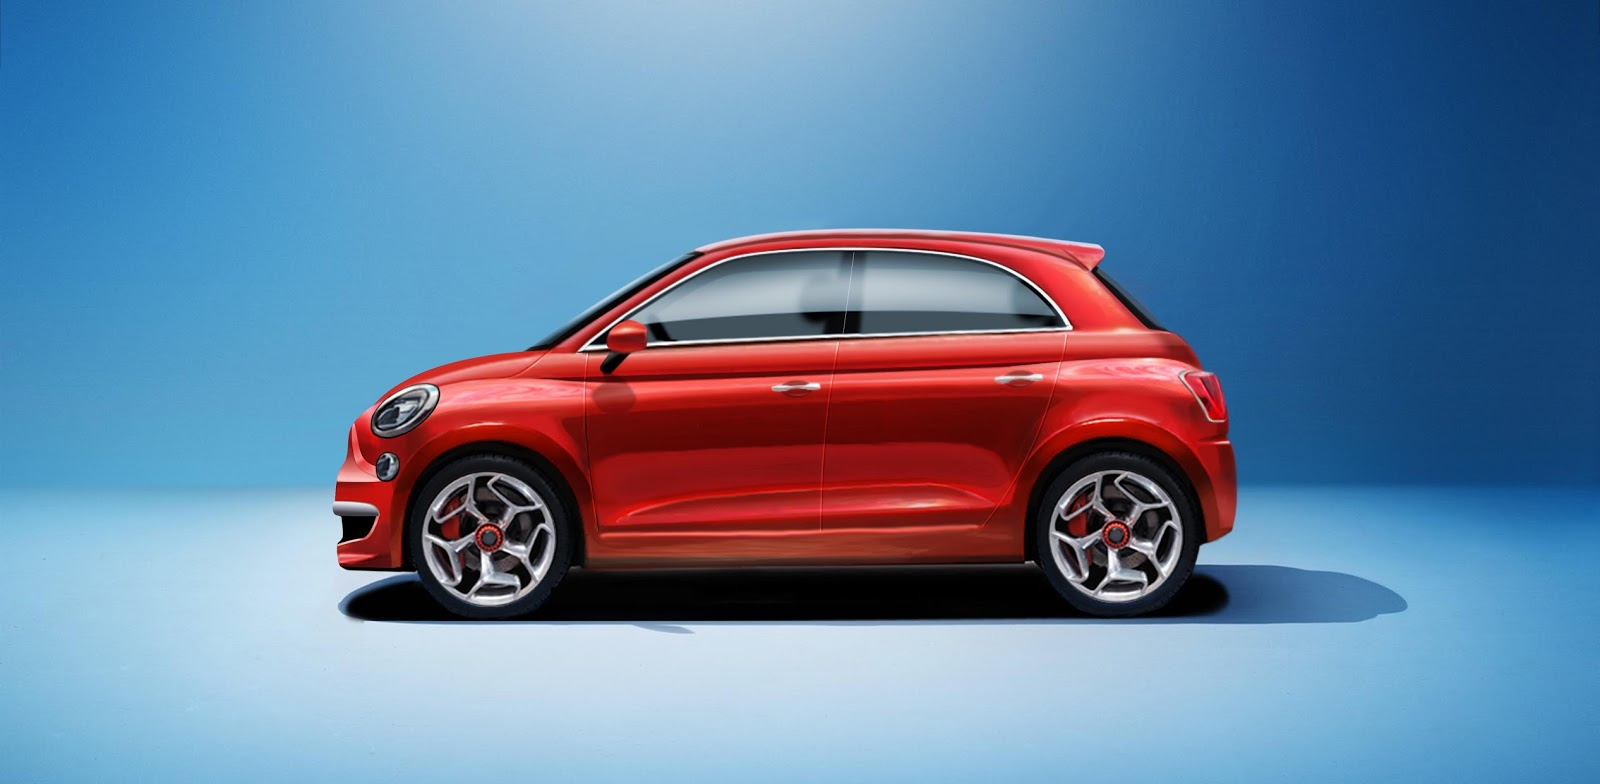 2015 - [Fiat] 500 Restylée - Page 23 500%2Bf%2Bside